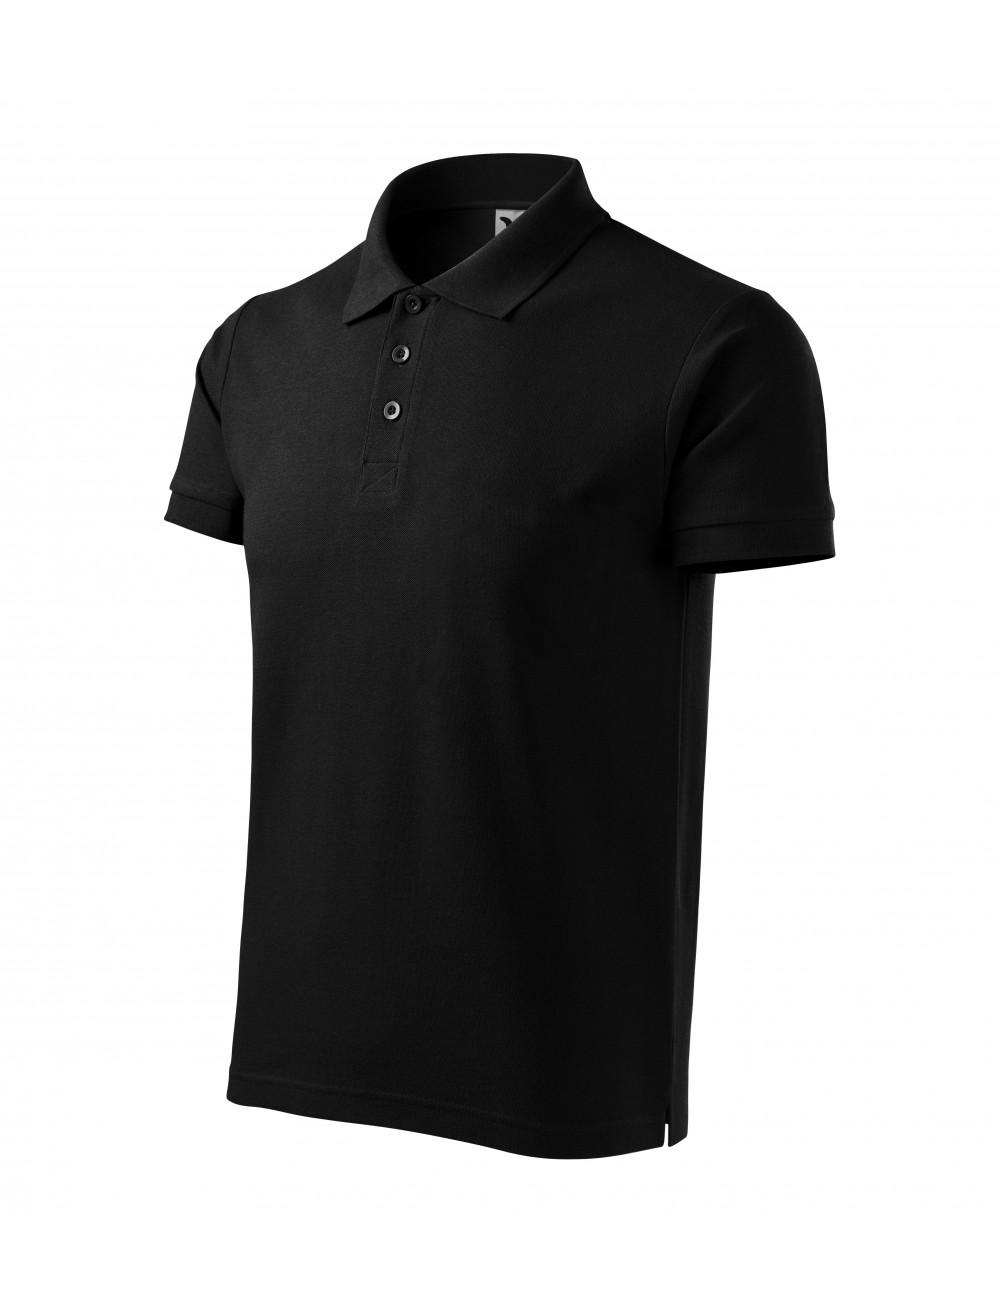 Adler MALFINI Koszulka polo męska Cotton Heavy 215 czarny